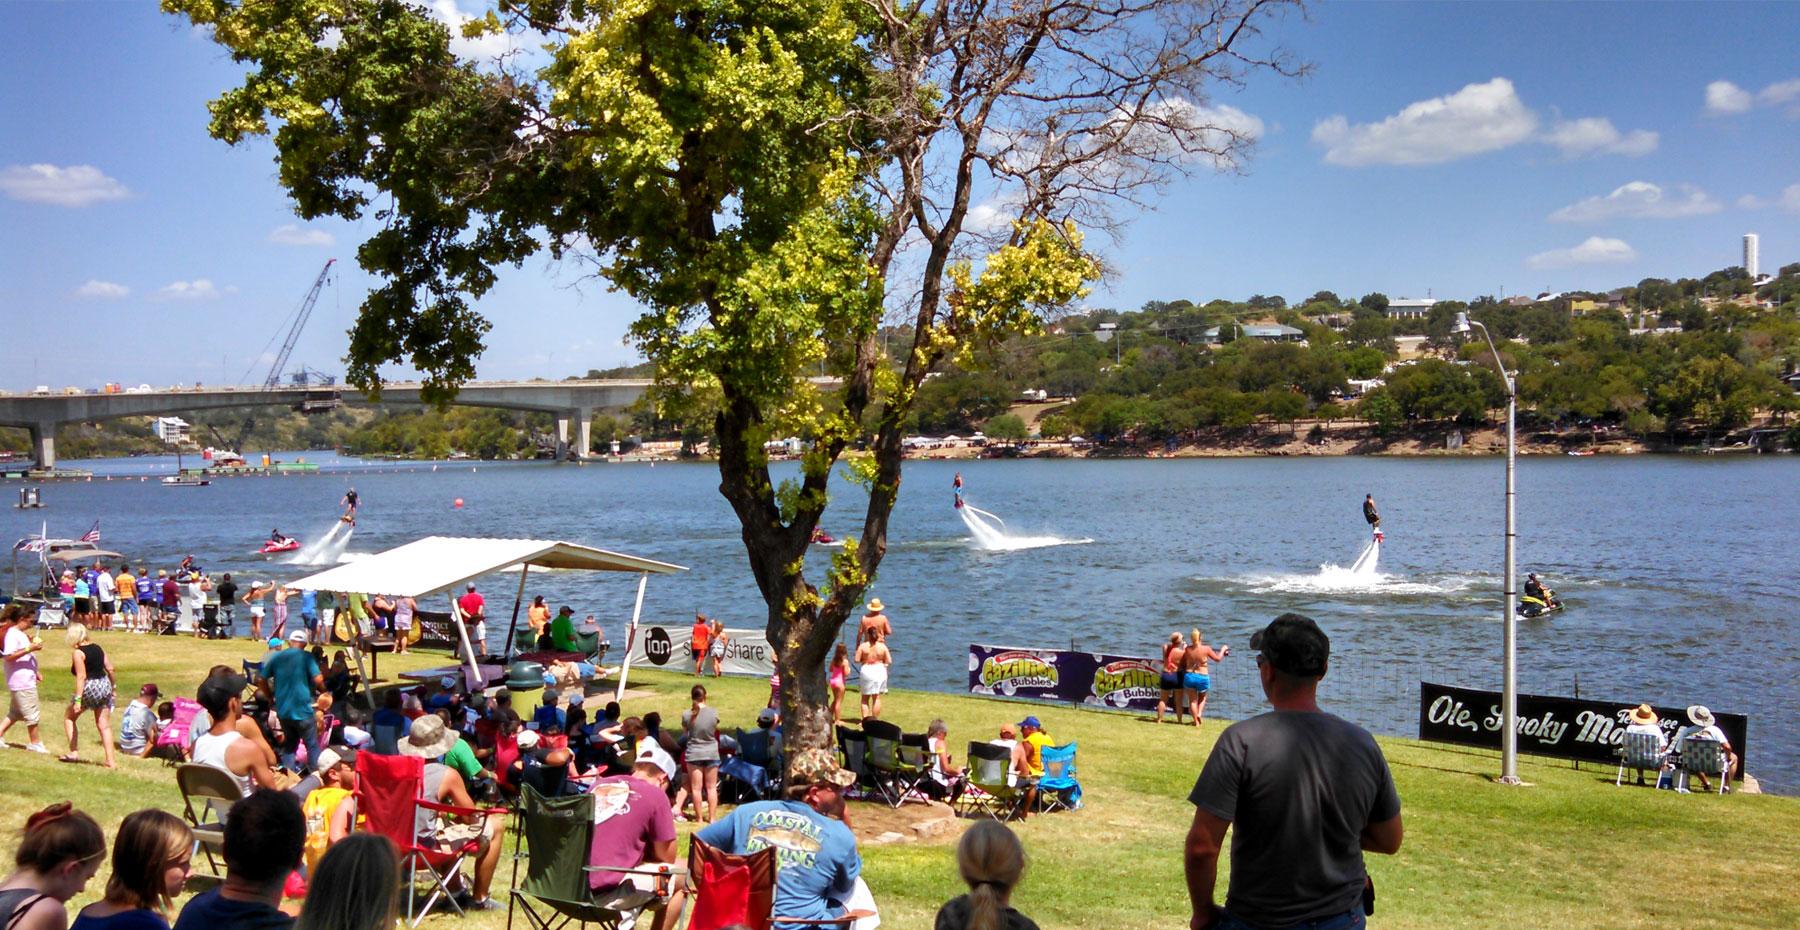 Festival on the lake near Marble Falls, TX